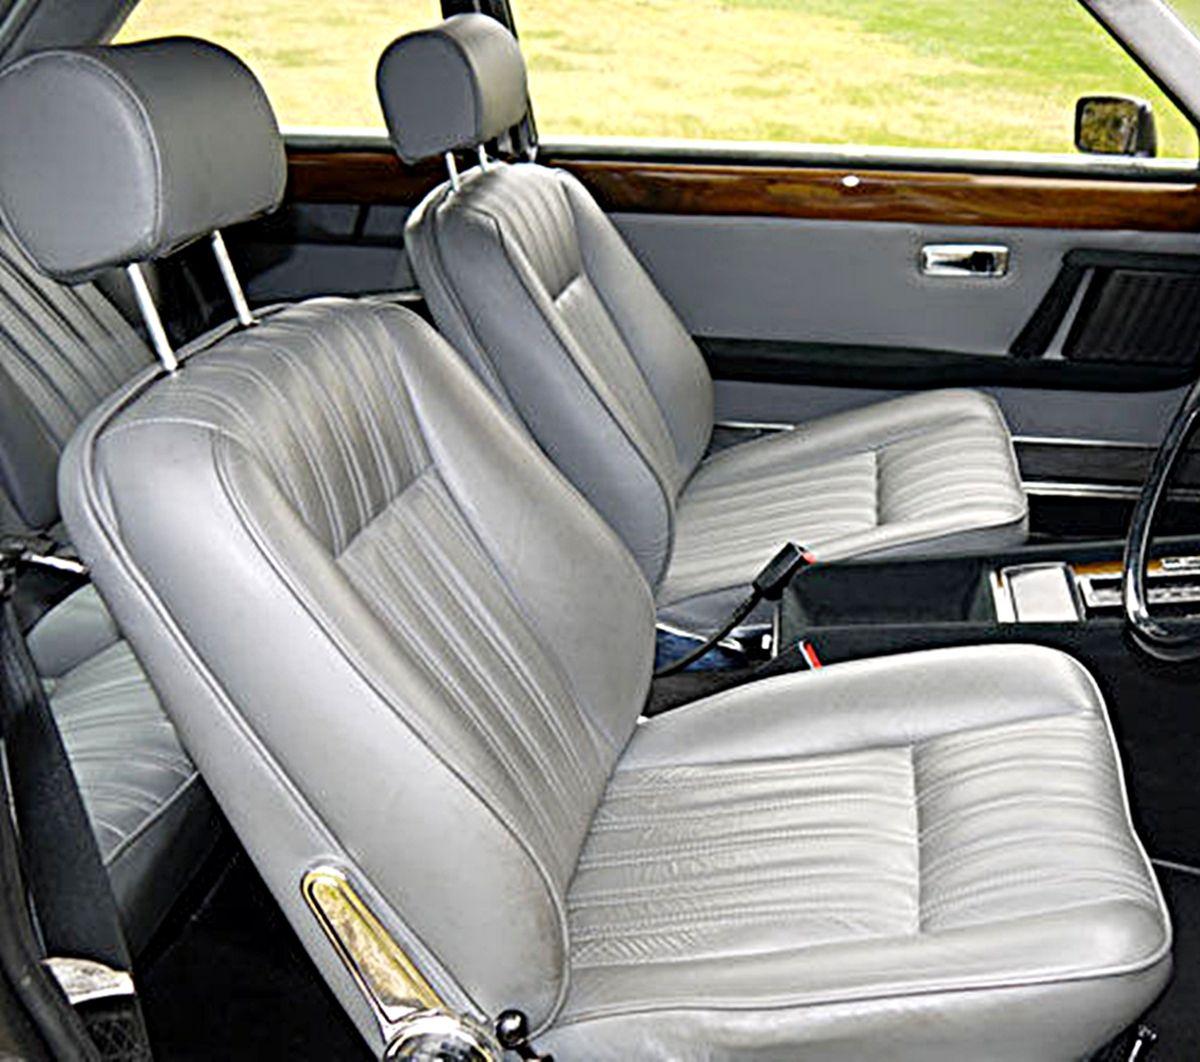 Fiat, Fiat Abarth, Classic Cars